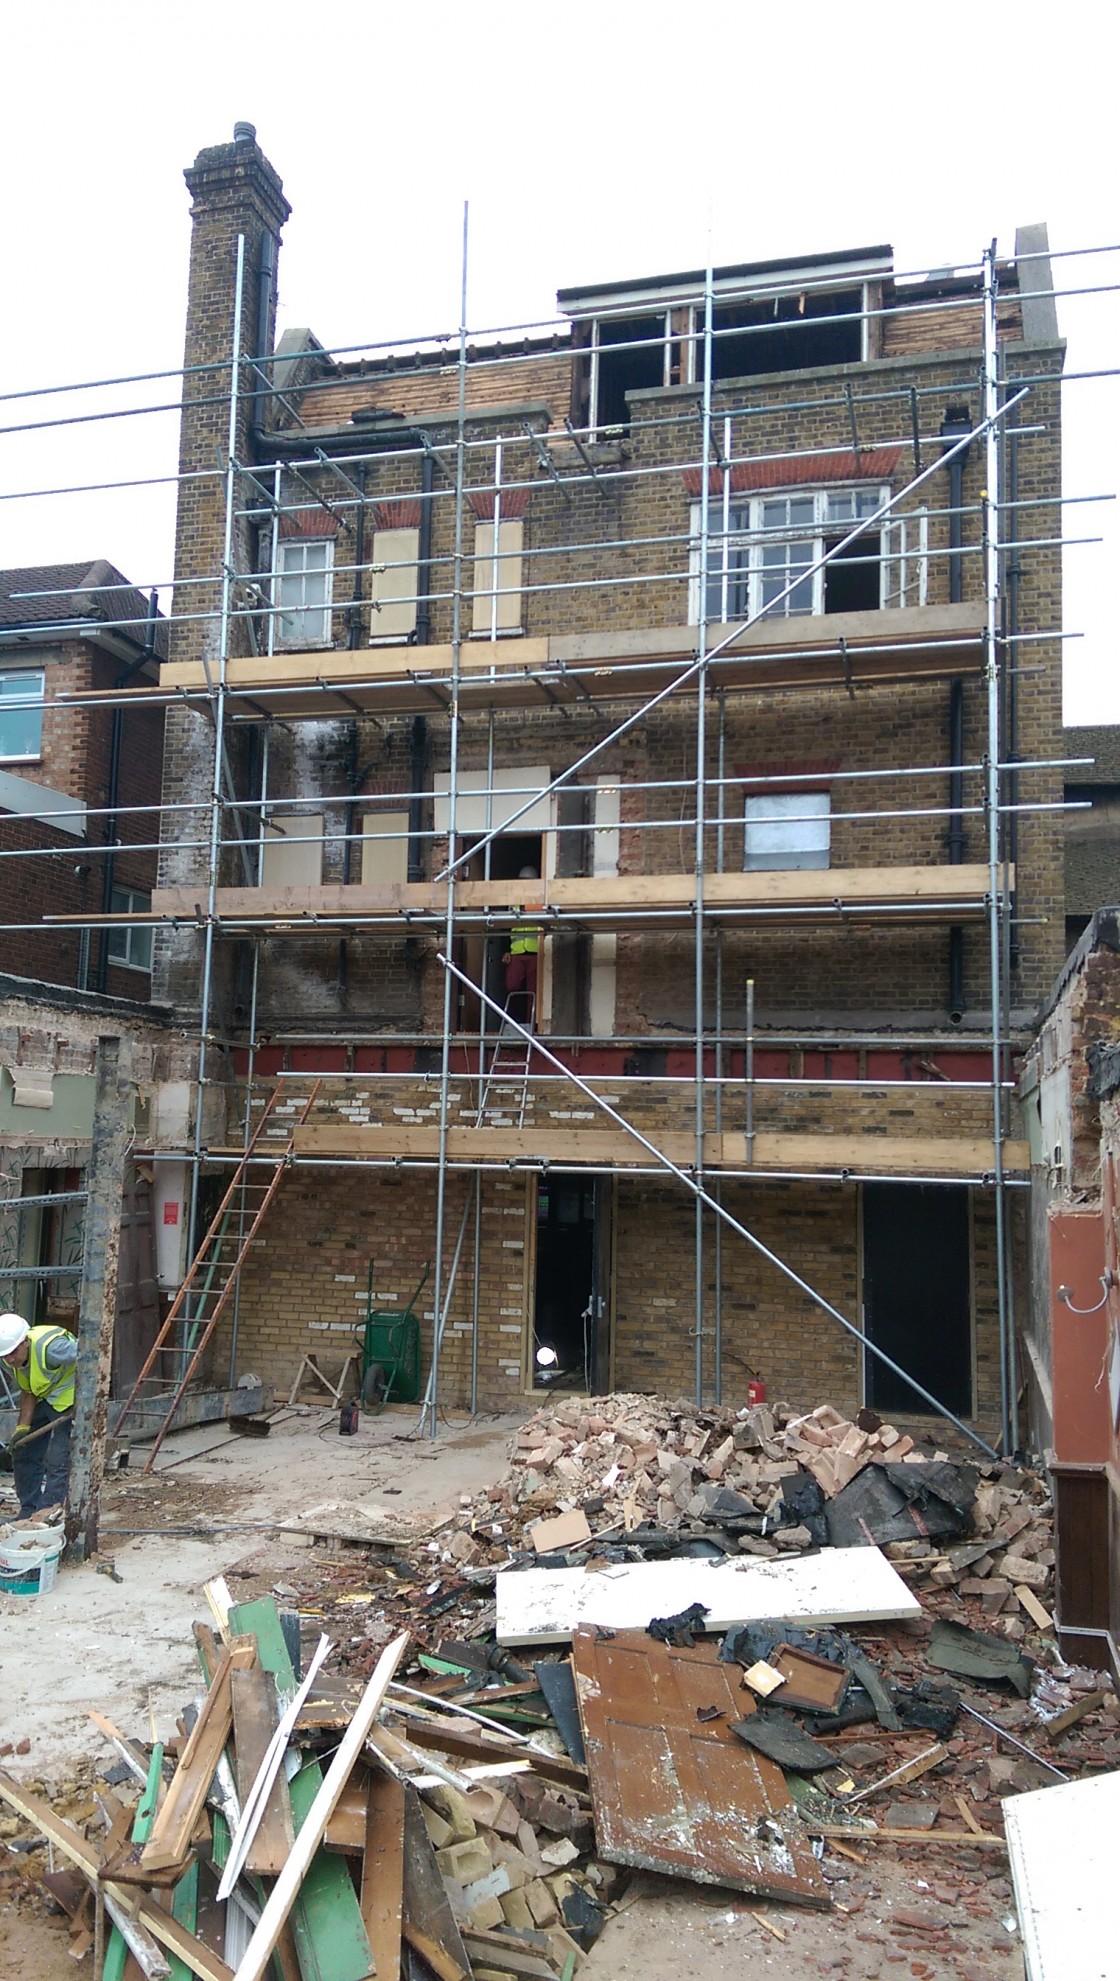 11 Court Yard, Eltham, London, SE95QE (Greenwich Council)